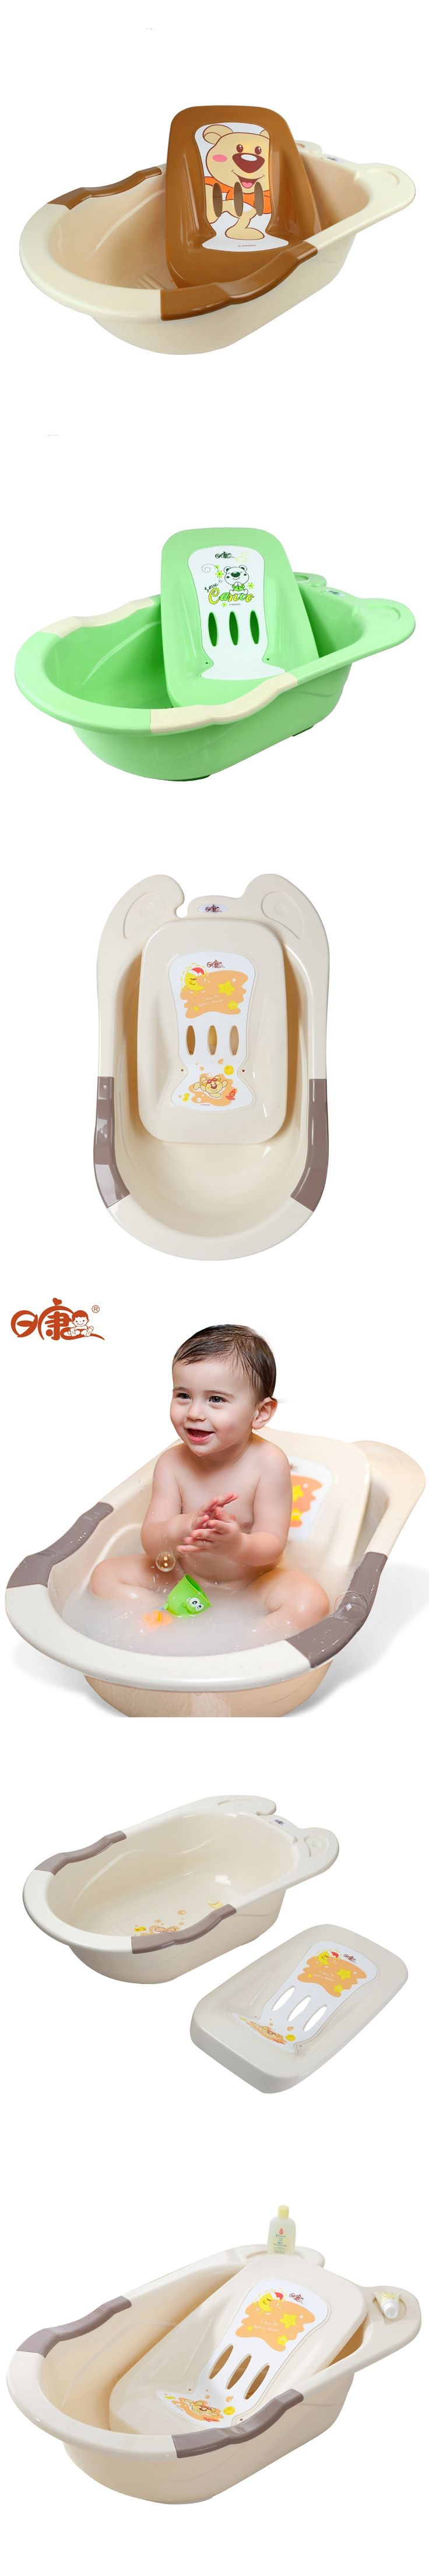 Baby Bathtub Pool Hot Tub Spa Plastic Bathtub Baby Bathtub Baby Shower Baby Bath Products Bath For Children